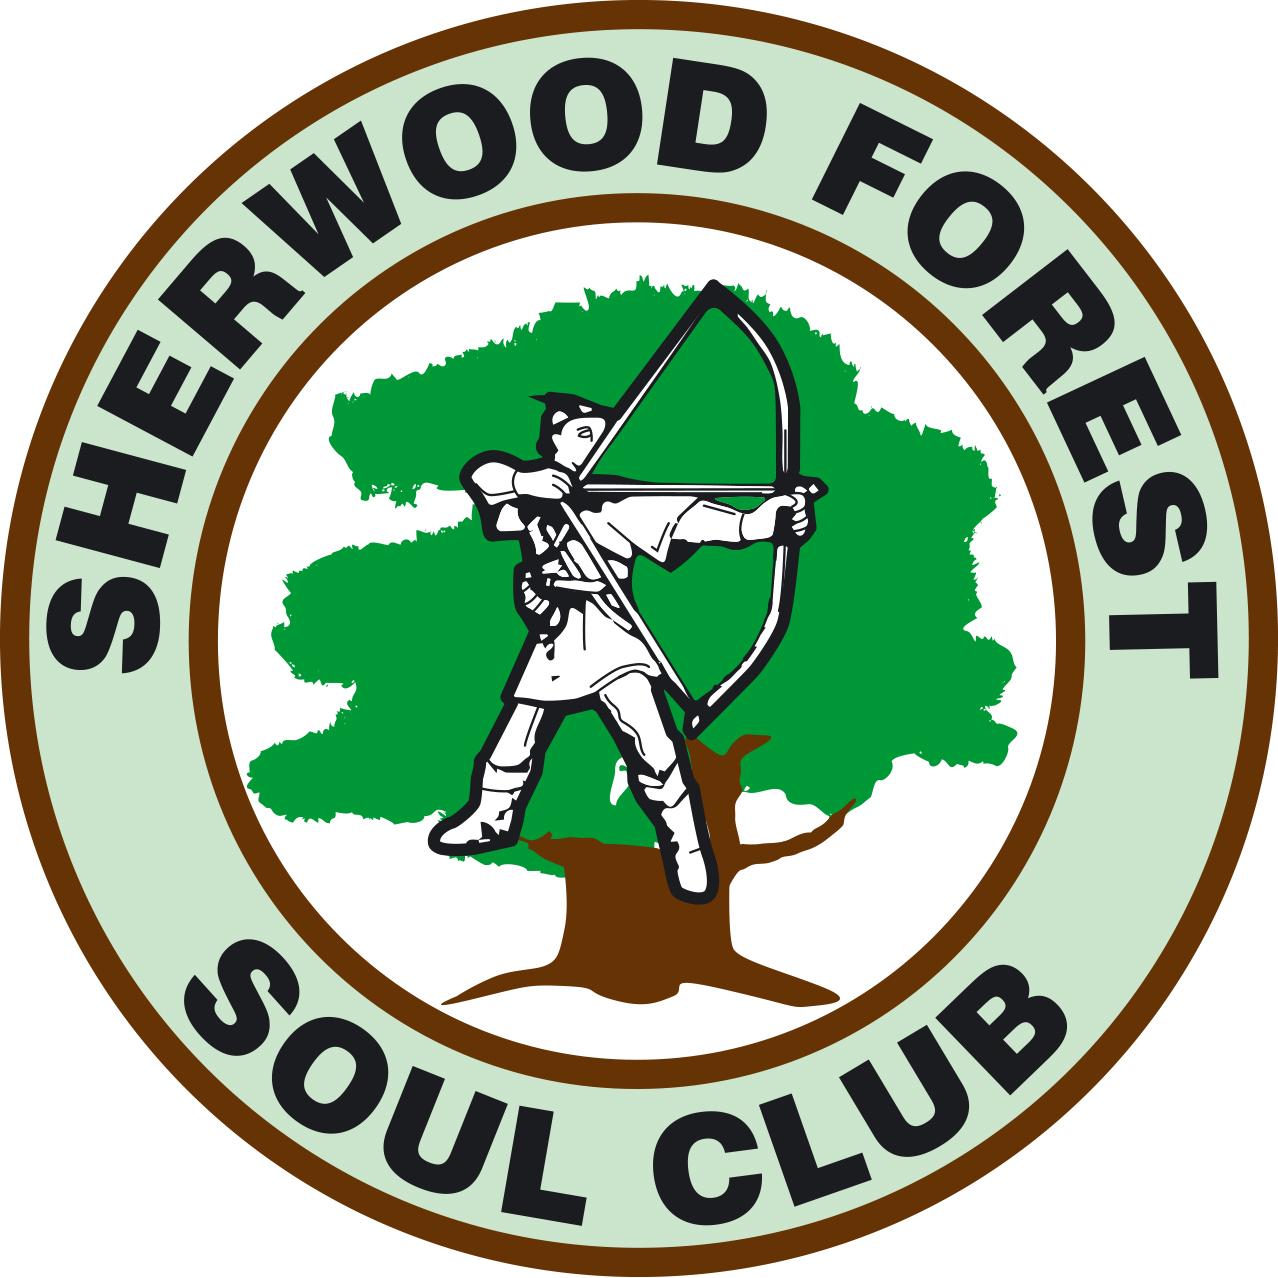 Sherwood Forest Soul Club Bilsthorpe Notts flyer